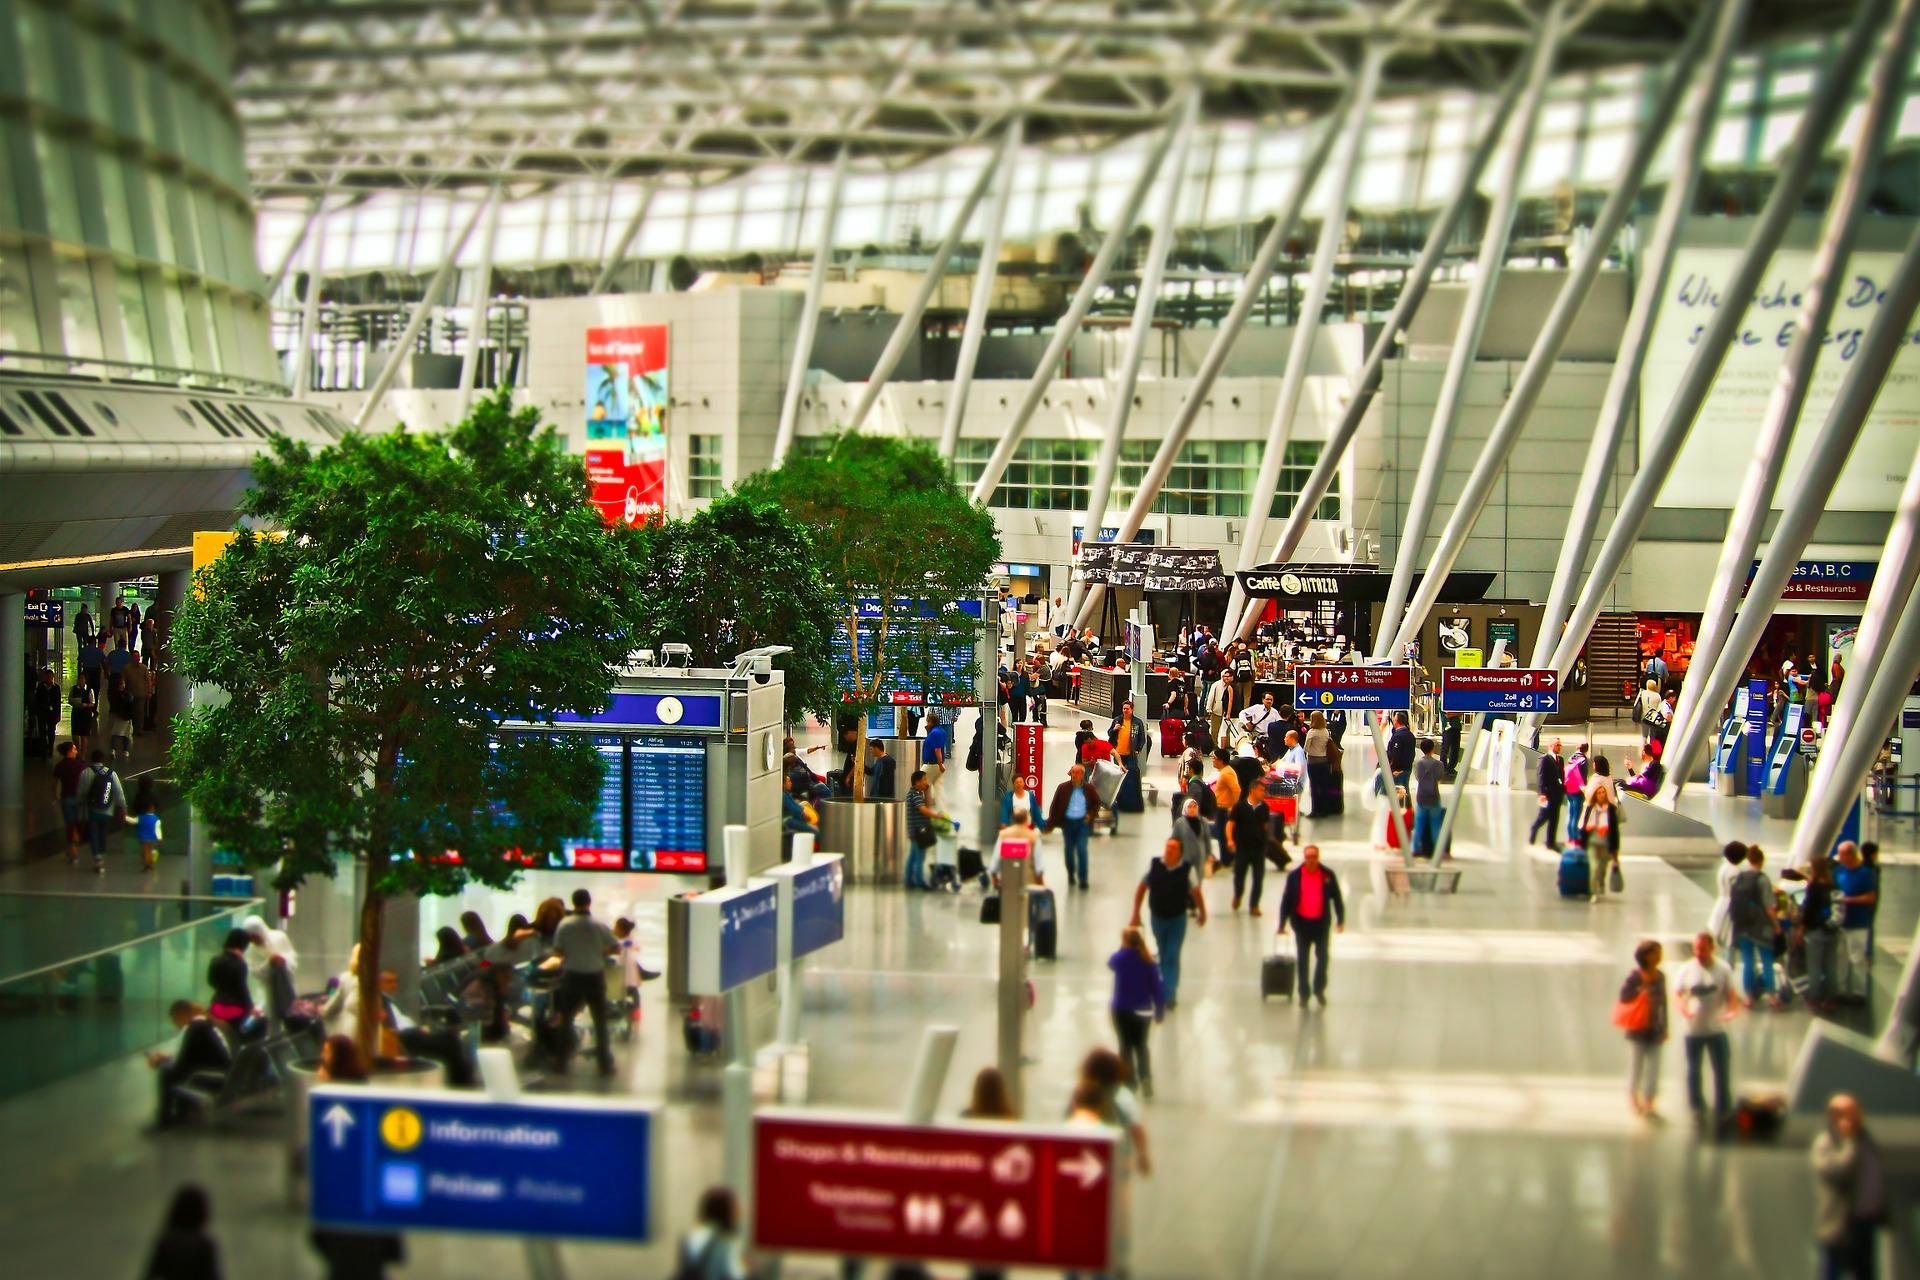 airport-1515448_1920.jpg